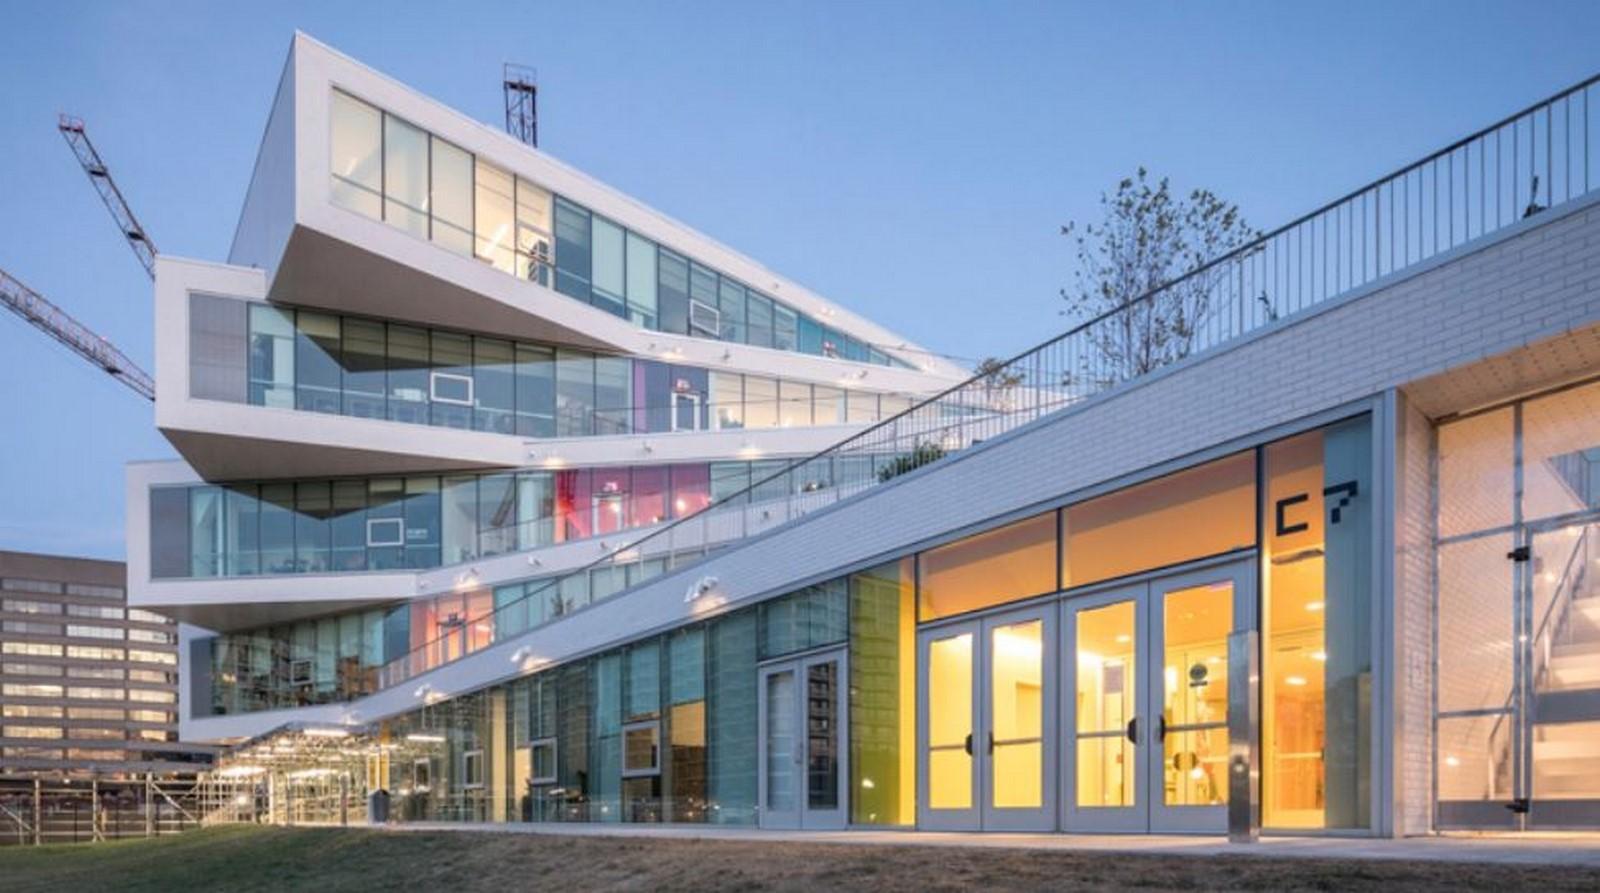 Architects in Omaha - Top 45 Architects in Omaha - Sheet28